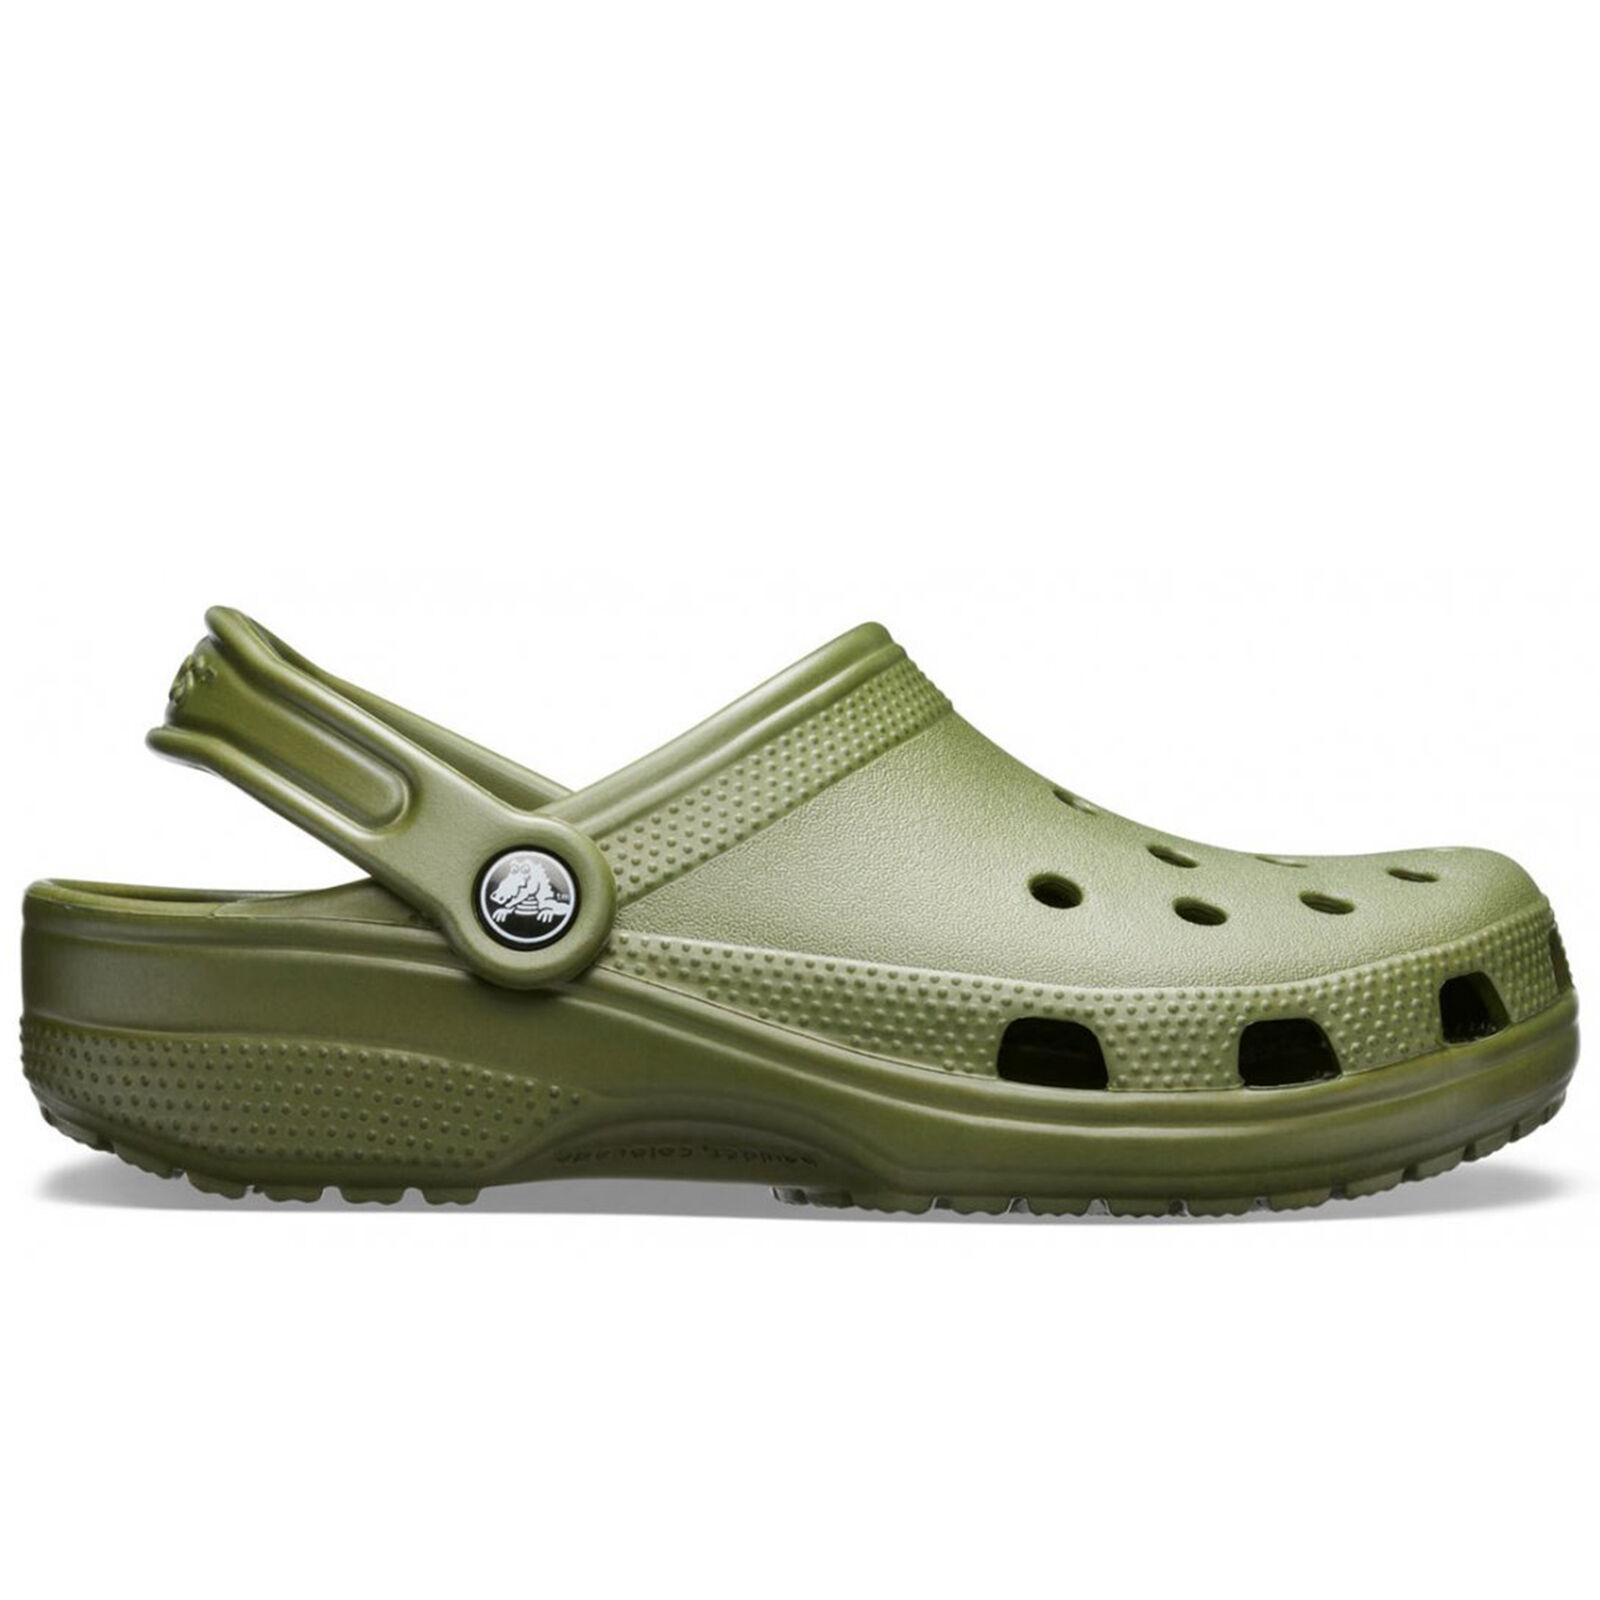 Shoes Crocs Classic Sabot Size 3 Uk Code 10001-309 -9MW